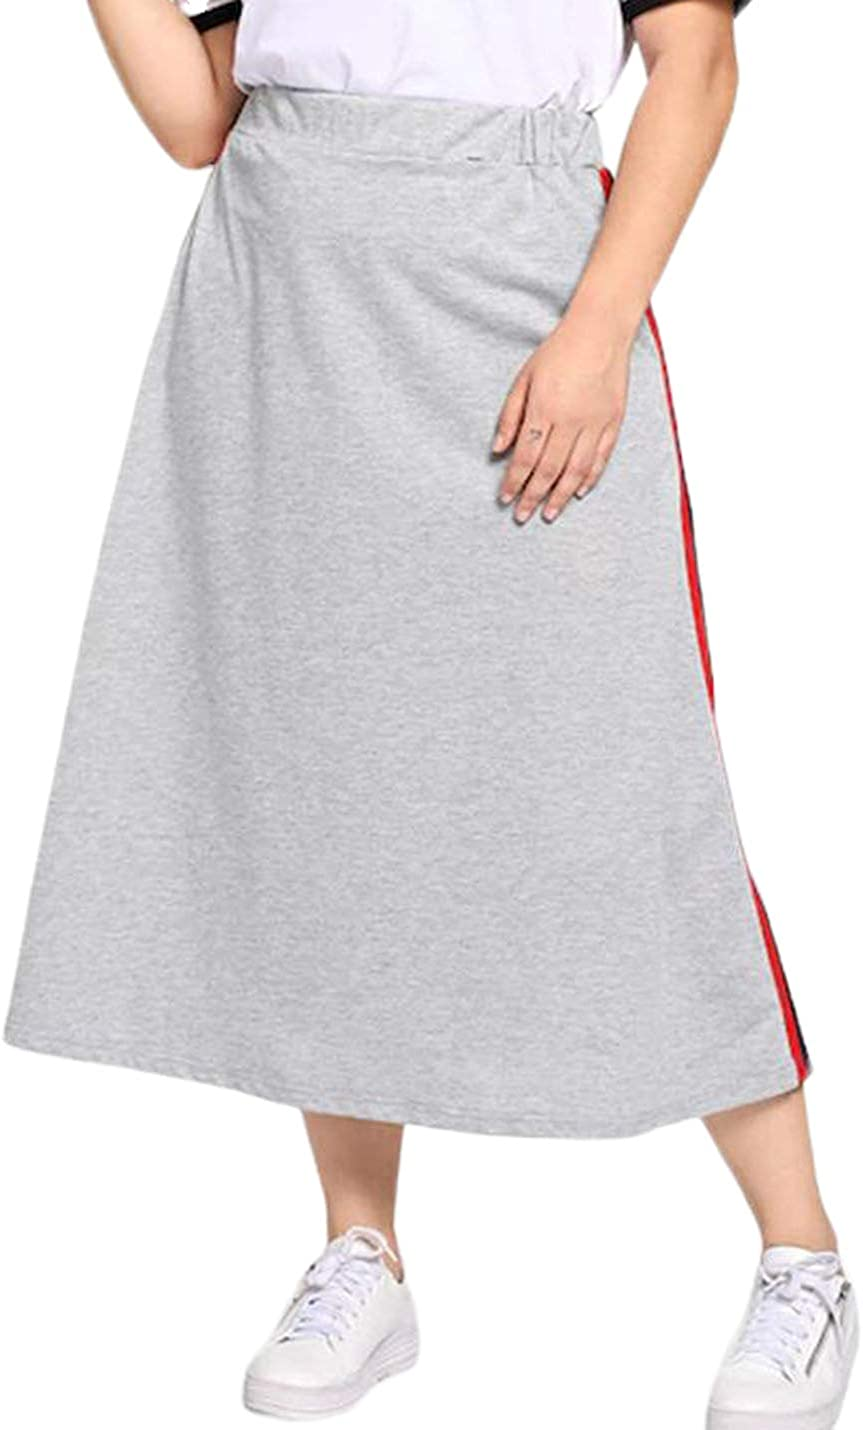 Uaneo Women's Oversized Casual Elastic Waist A-Line Flared Midi Swing Skirt